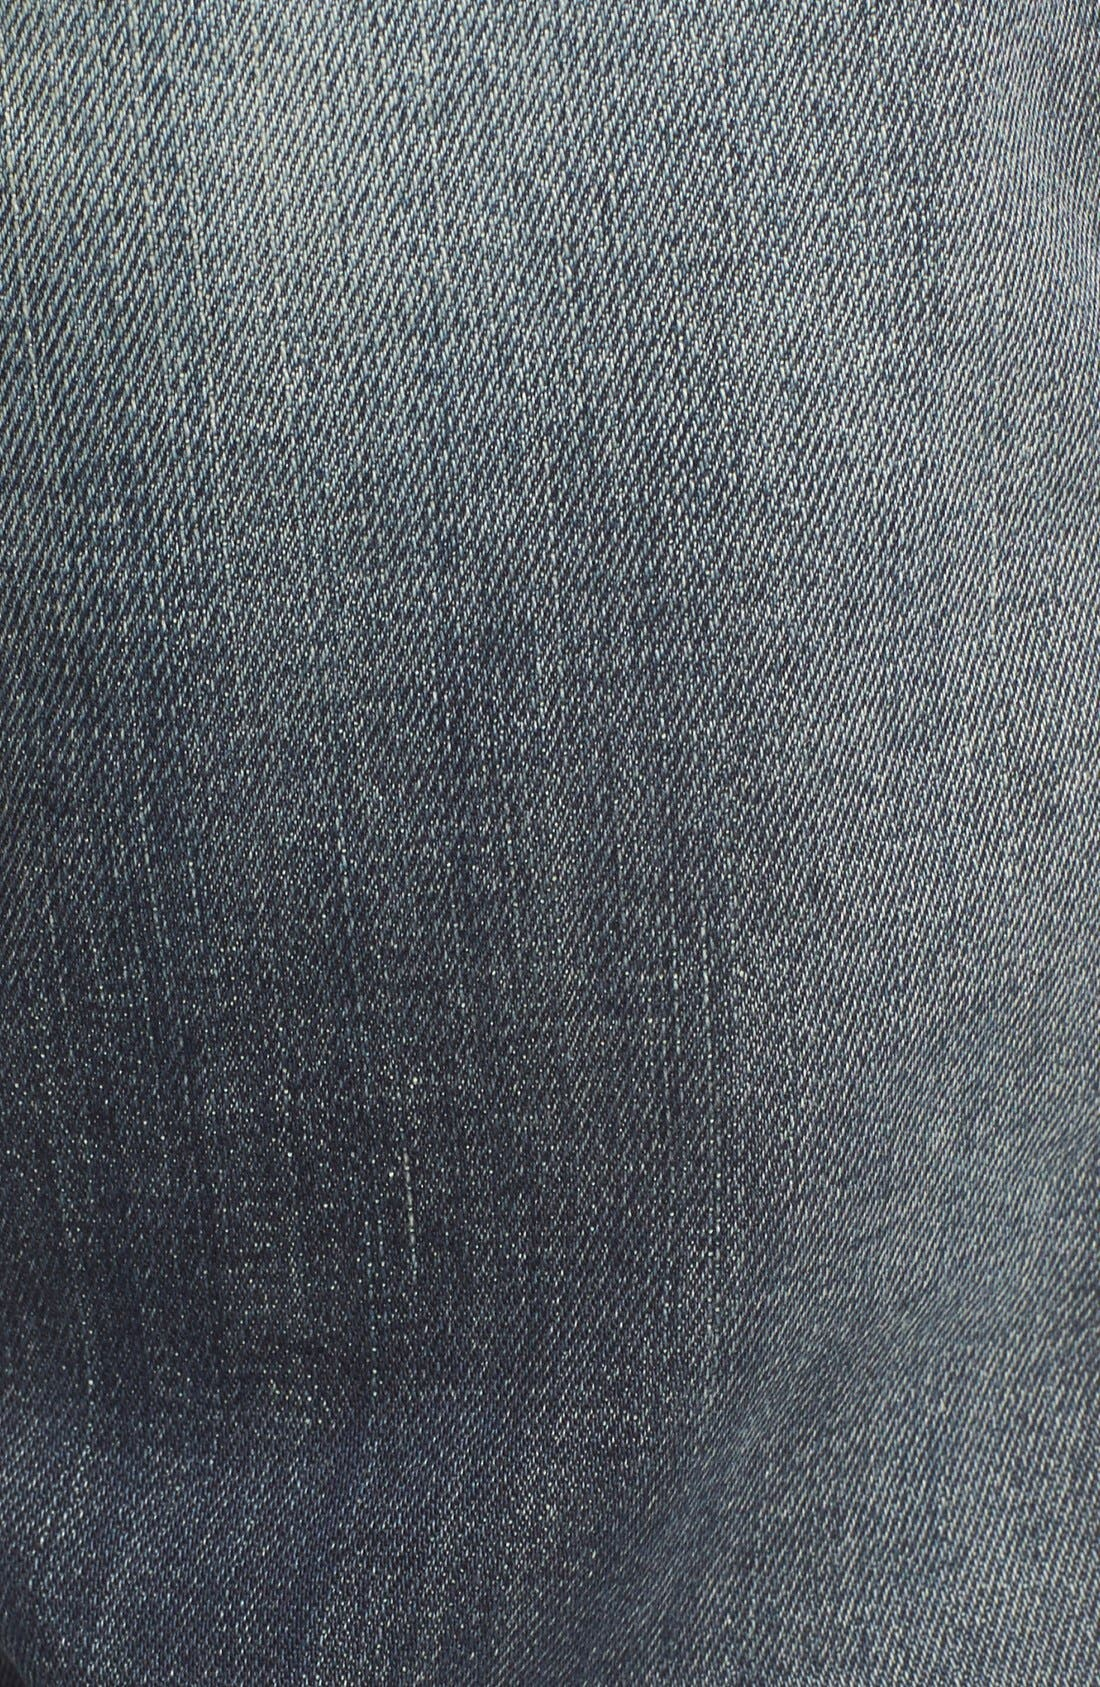 'Zathan' Bootcut Jeans,                             Alternate thumbnail 3, color,                             400